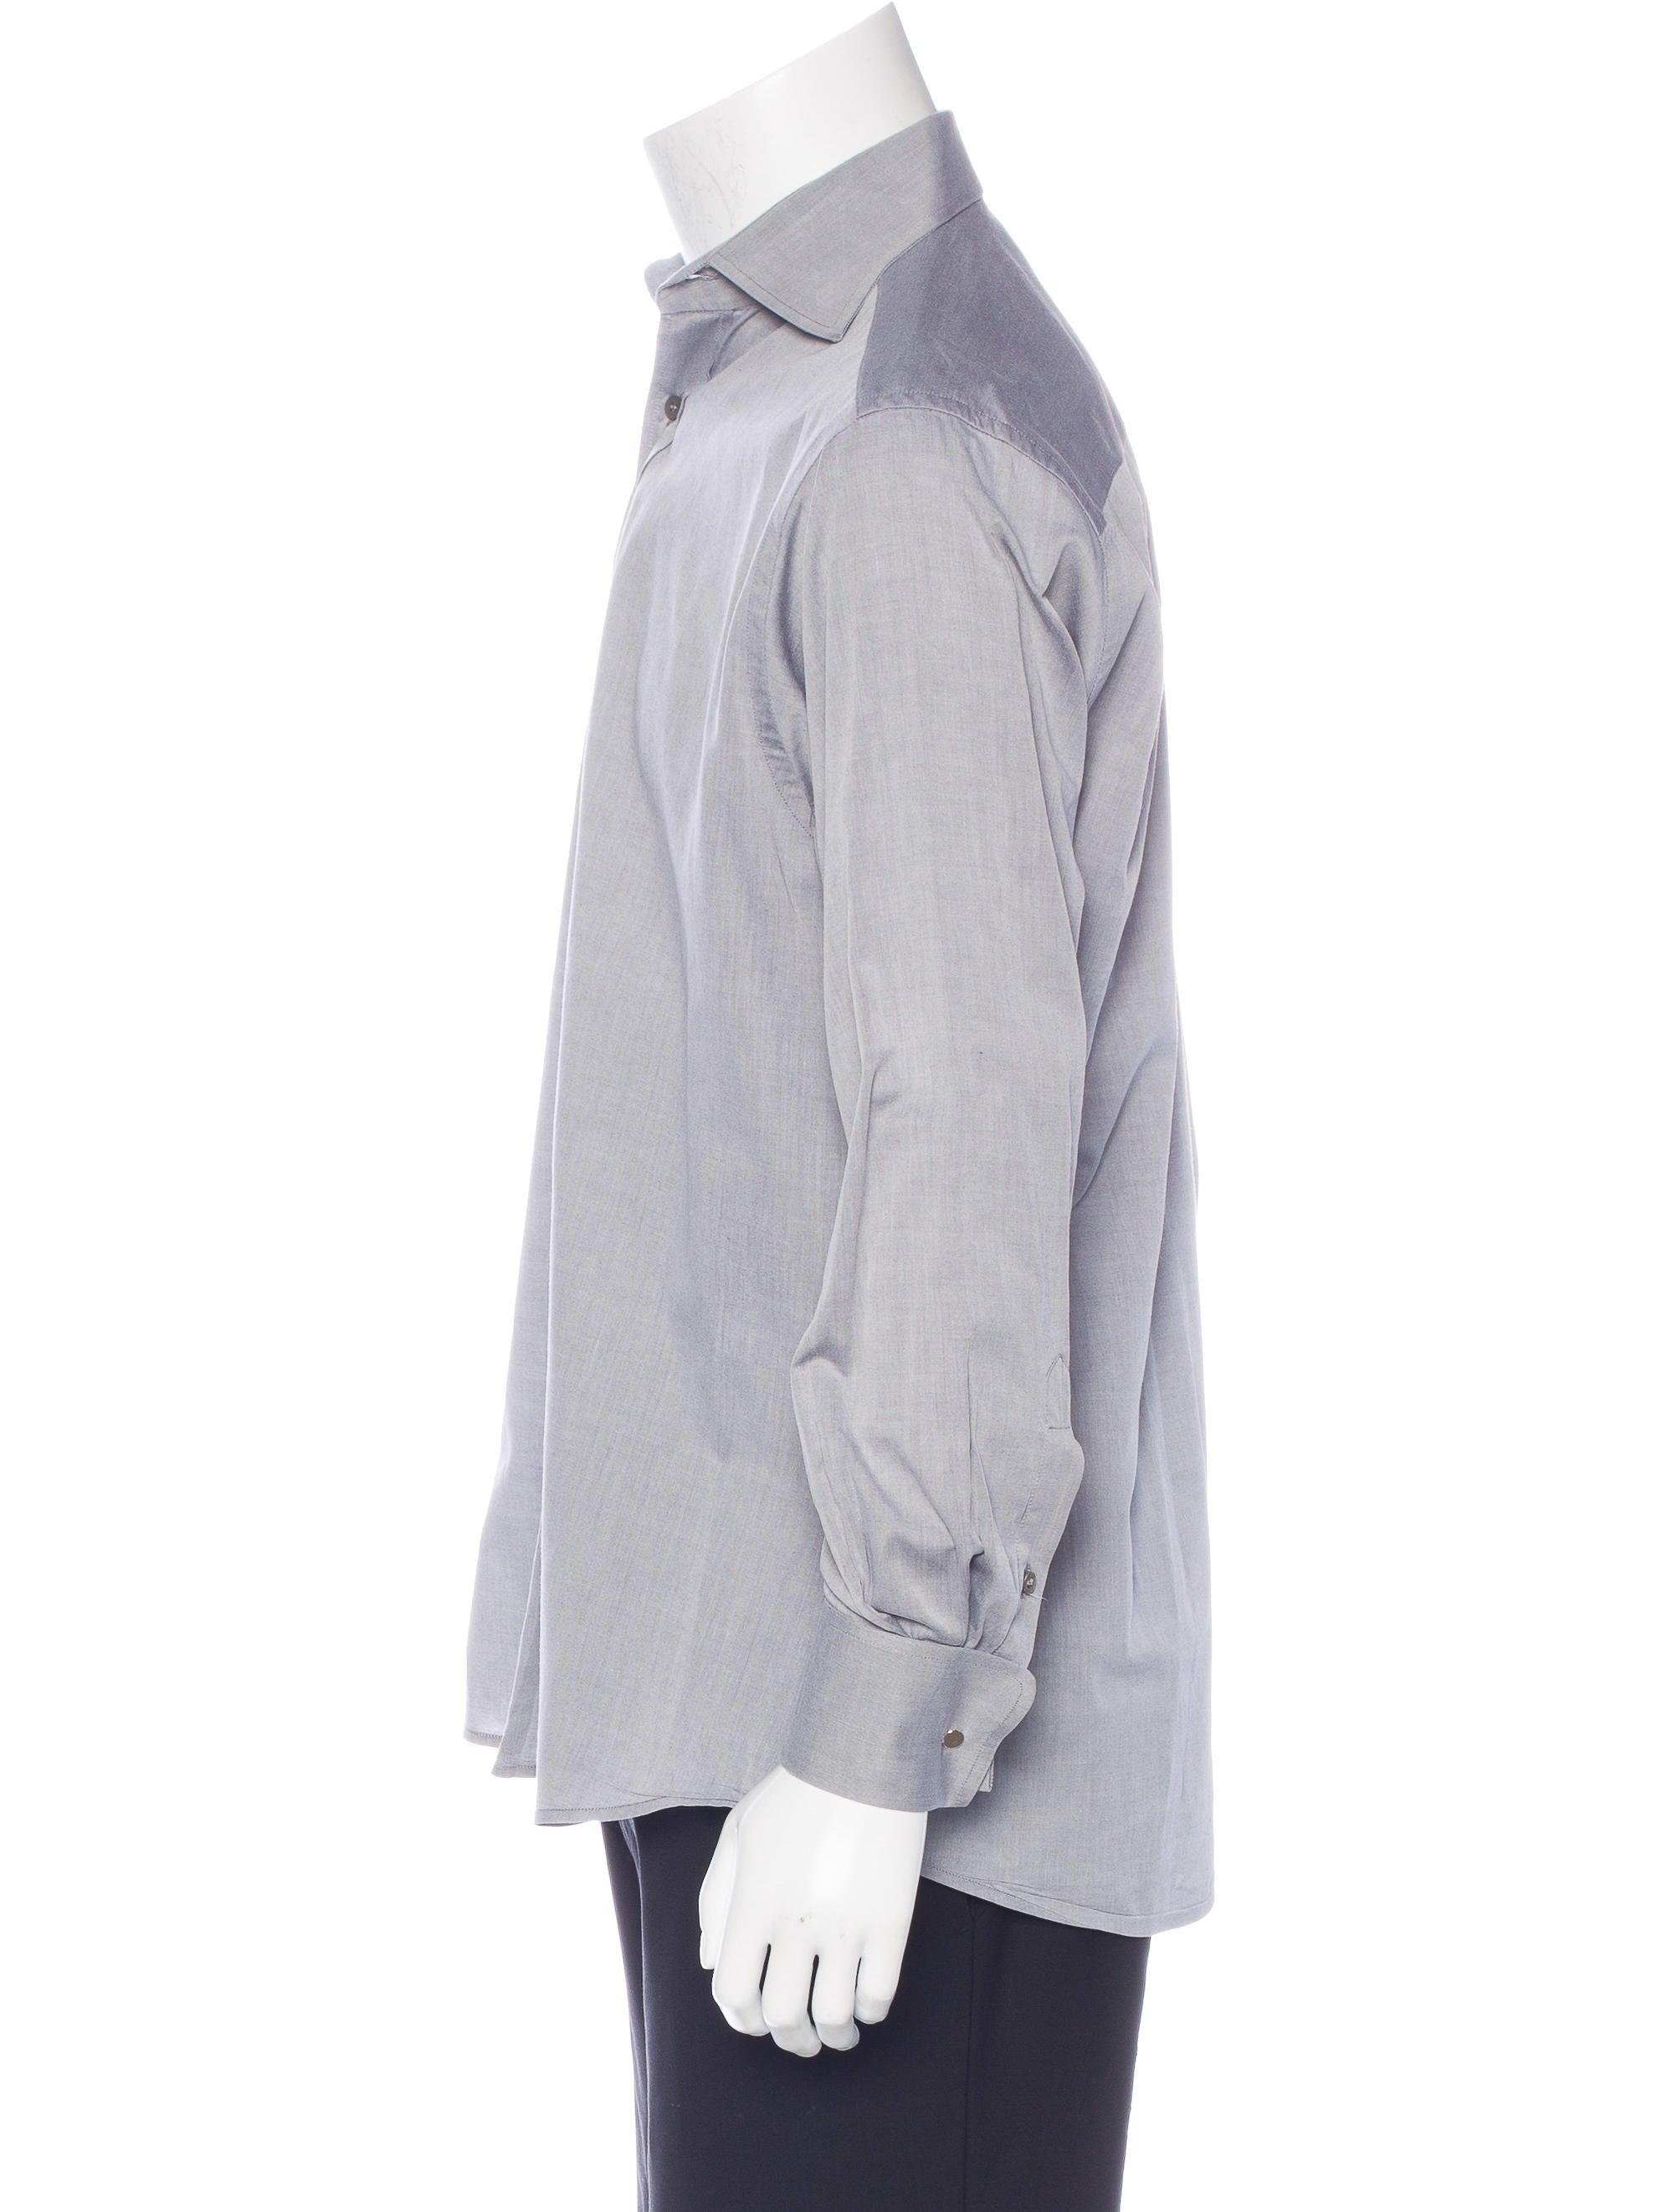 Gucci french cuff dress shirt clothing guc153576 the for Men french cuff dress shirts